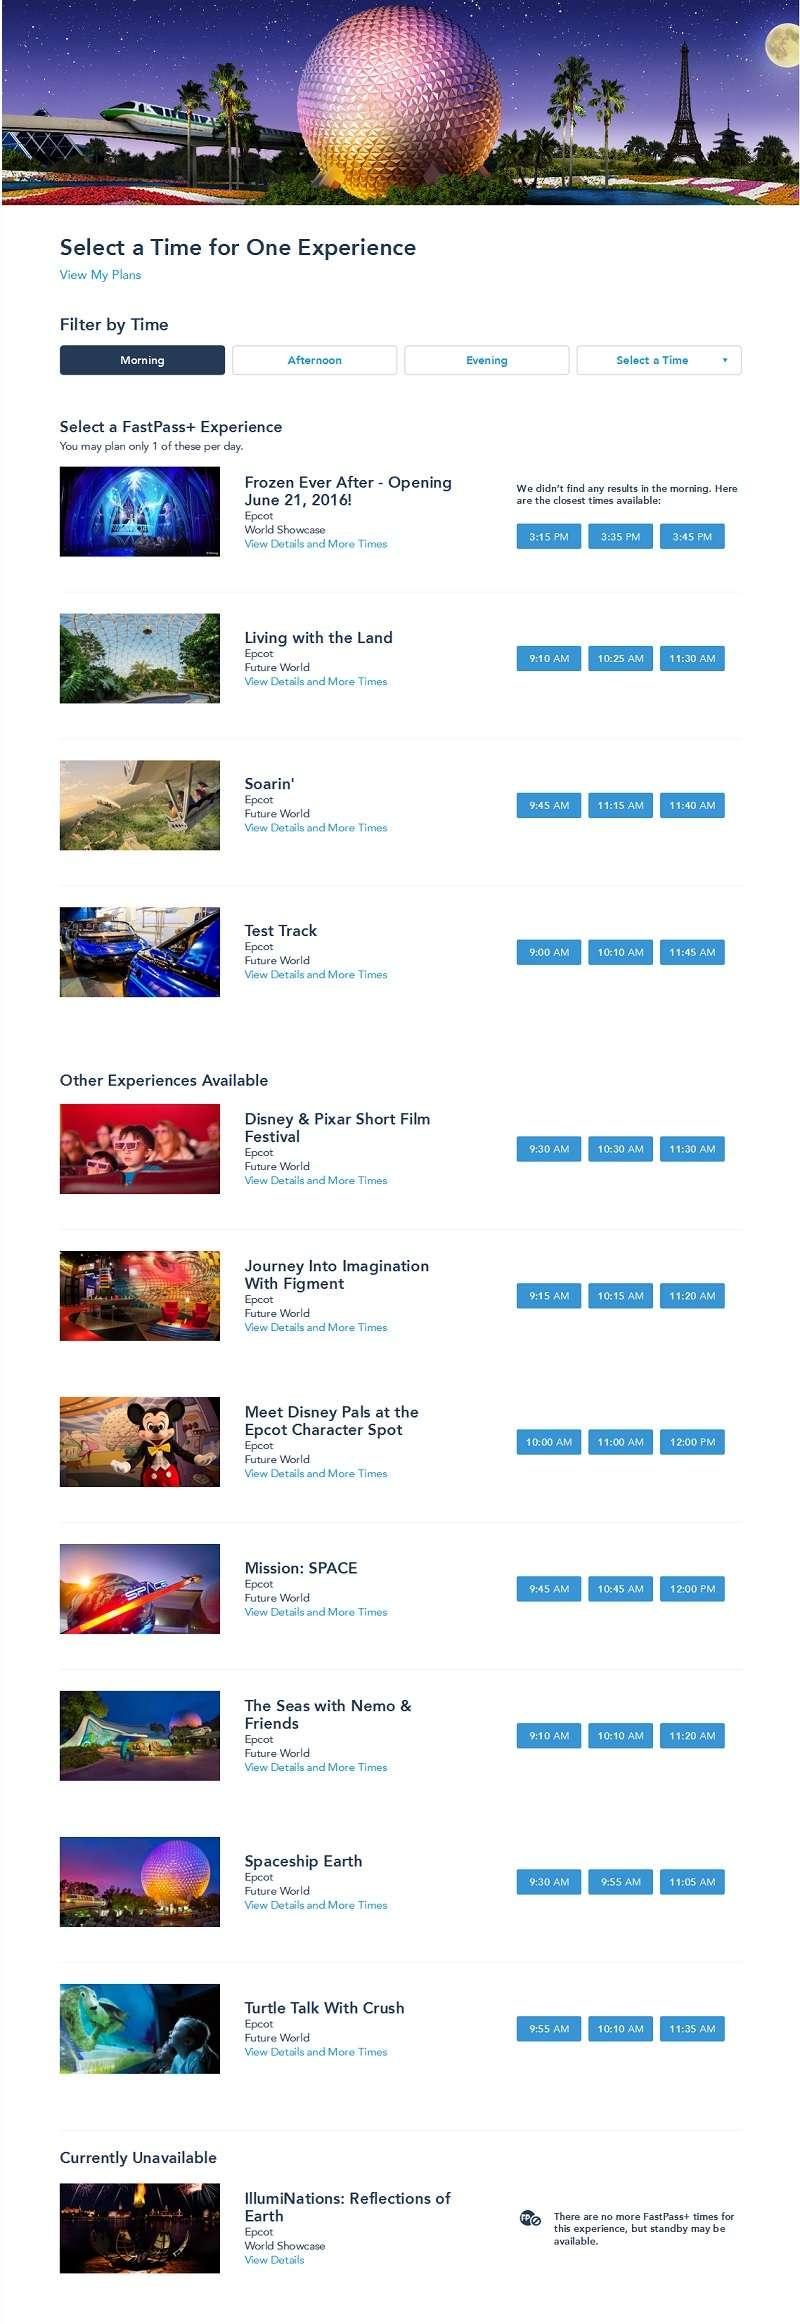 [Walt Disney World Resort] Tout savoir pour préparer son voyage - Page 3 Epfpa310